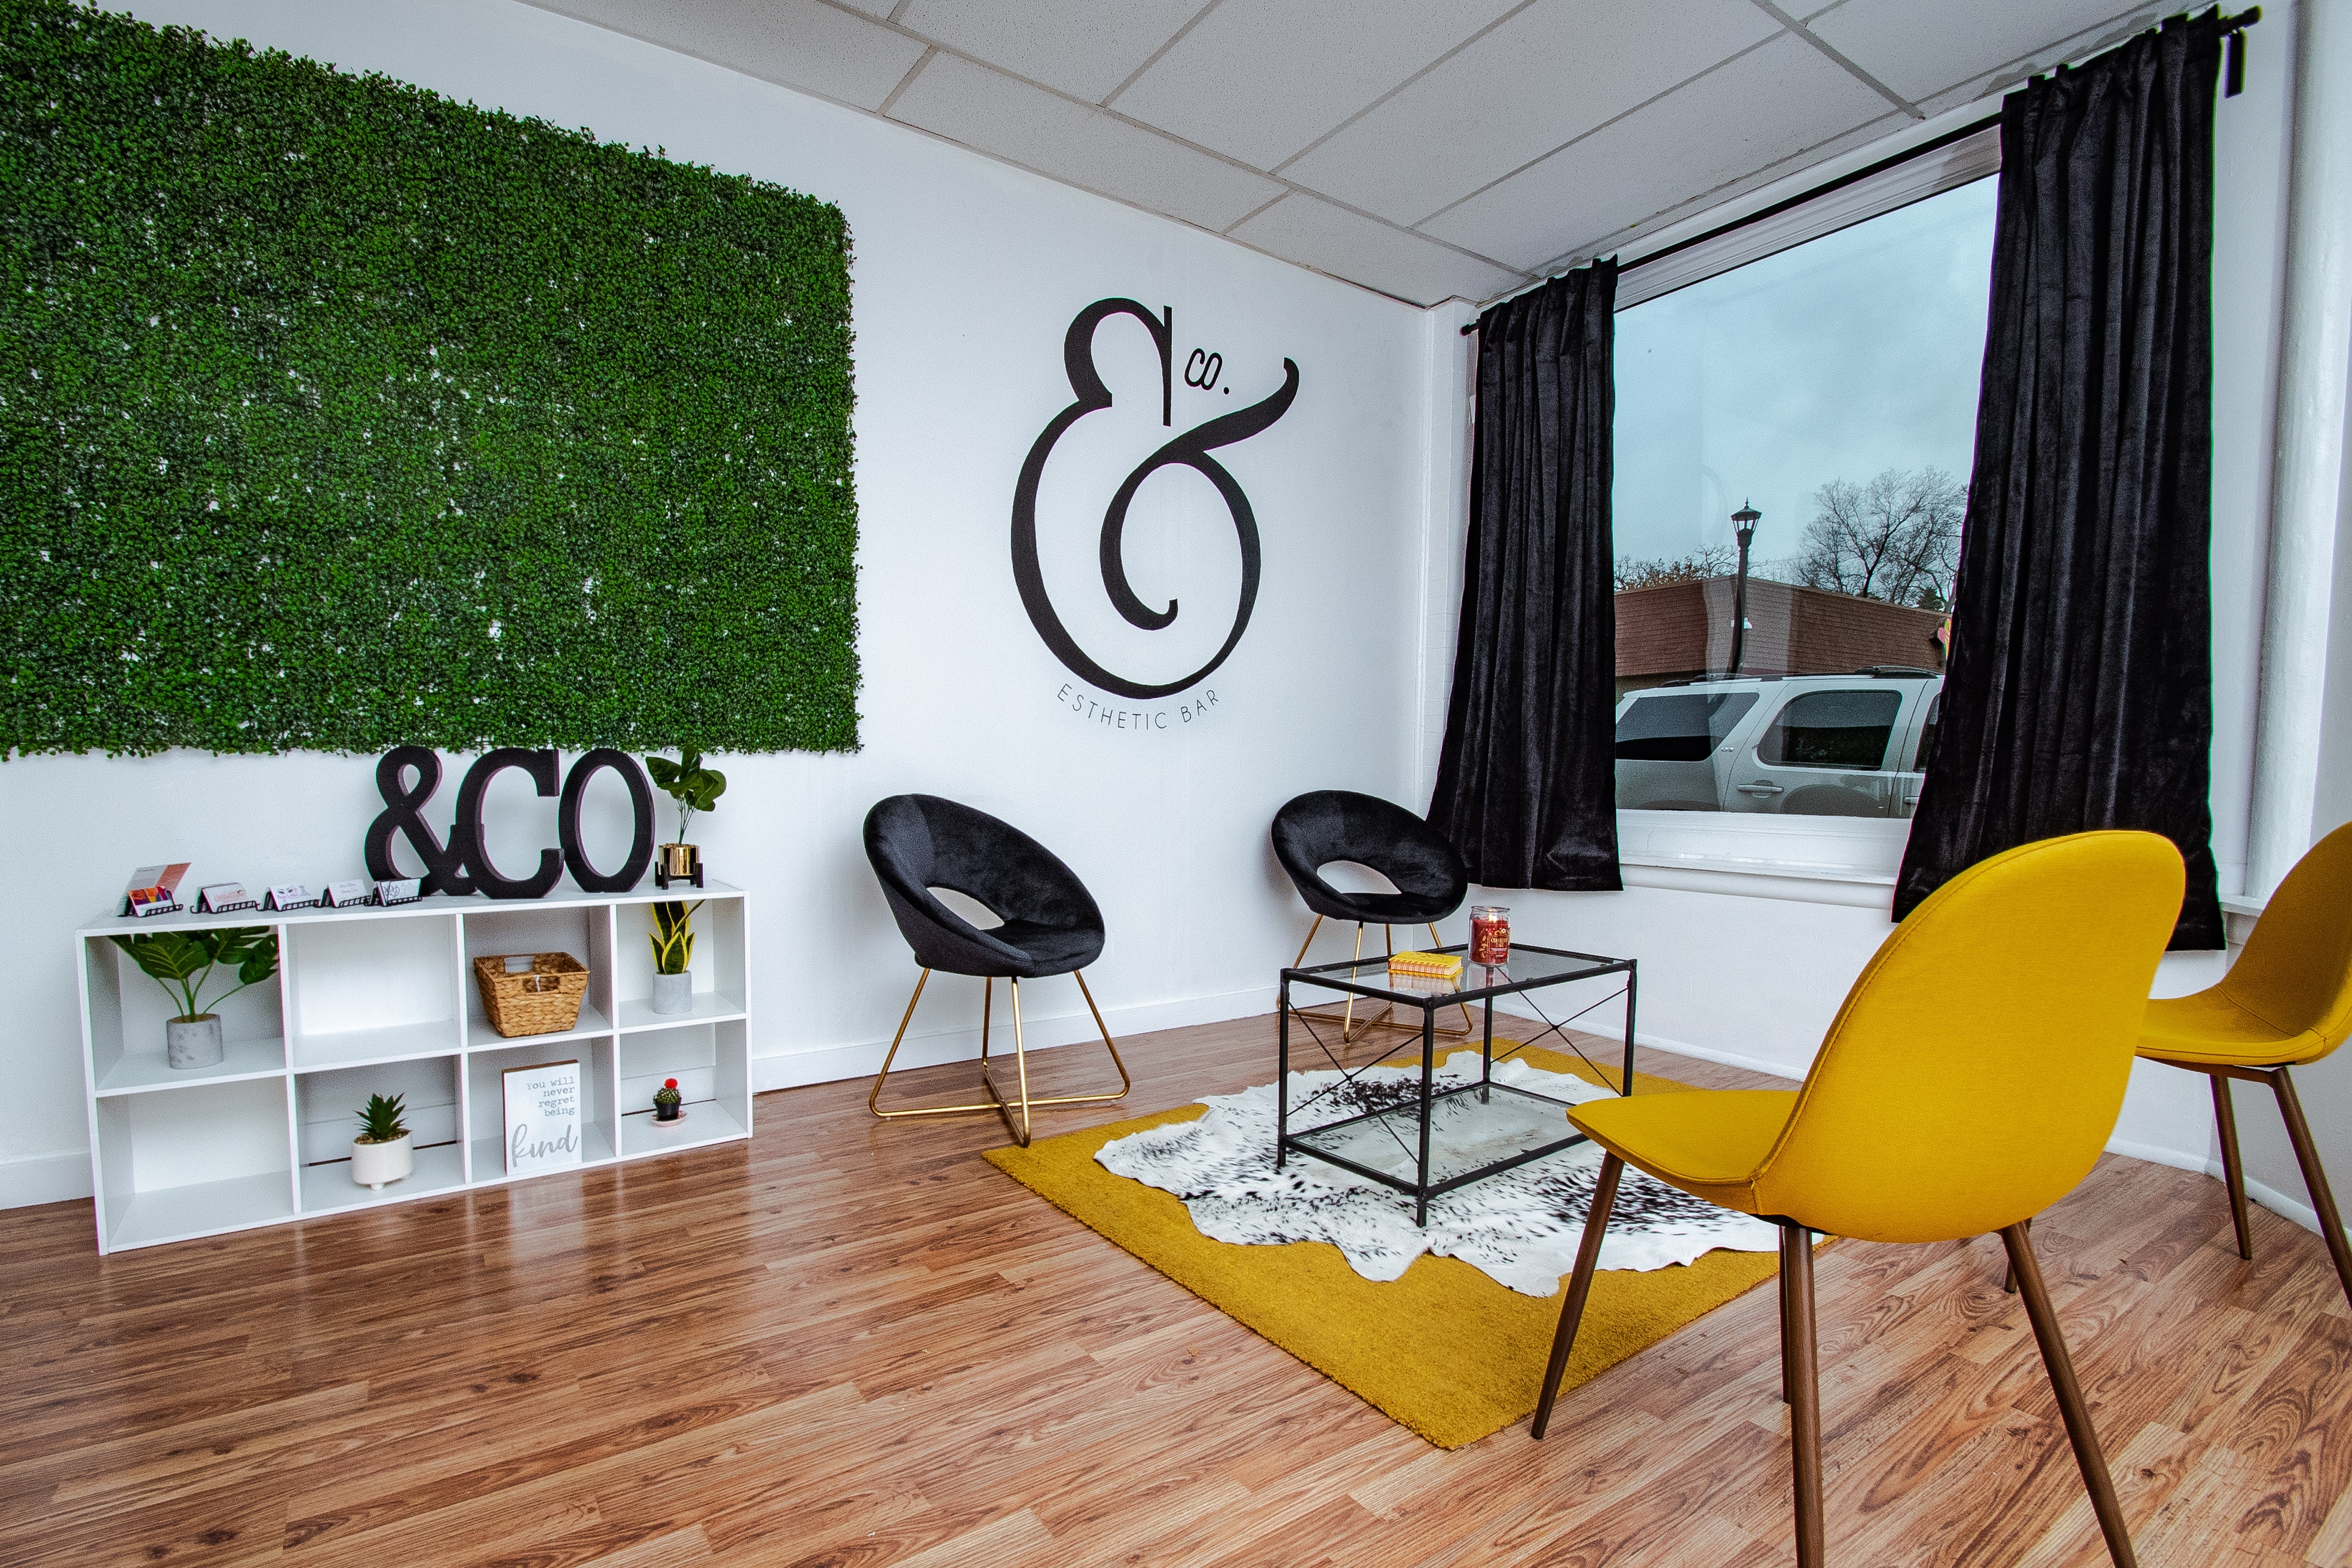 & Company Esthetic Bar Lounge